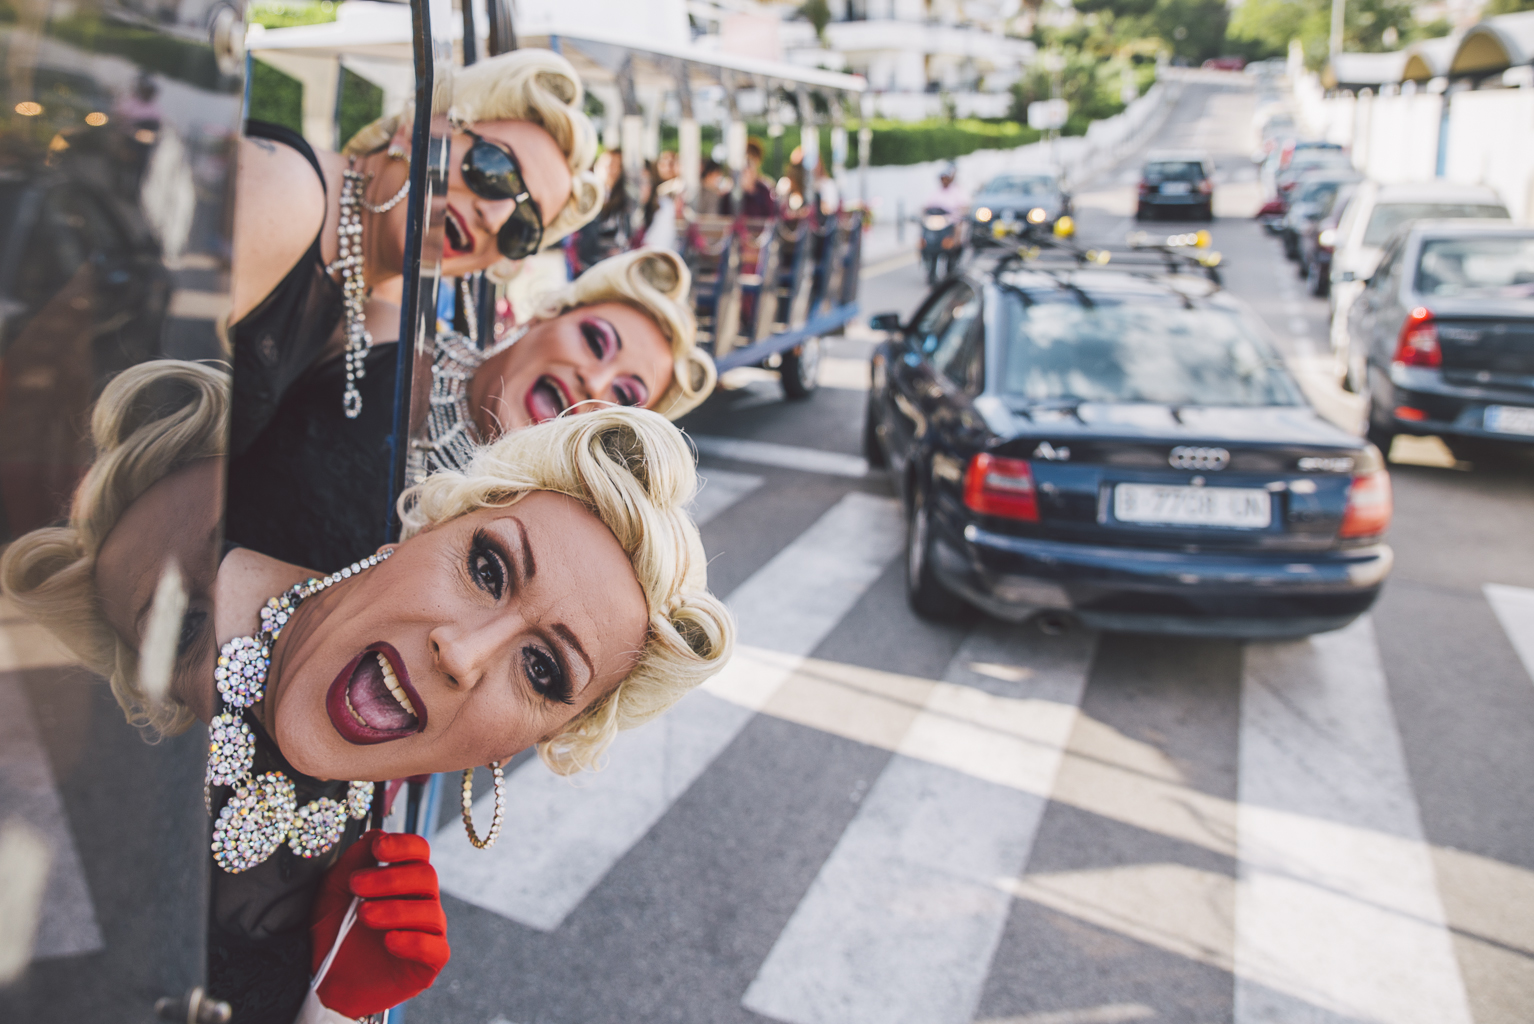 fotógrafo de boda gay sitges :: fotógrafo de boda barcelona :: fotógrafo de bodas hommosexuales